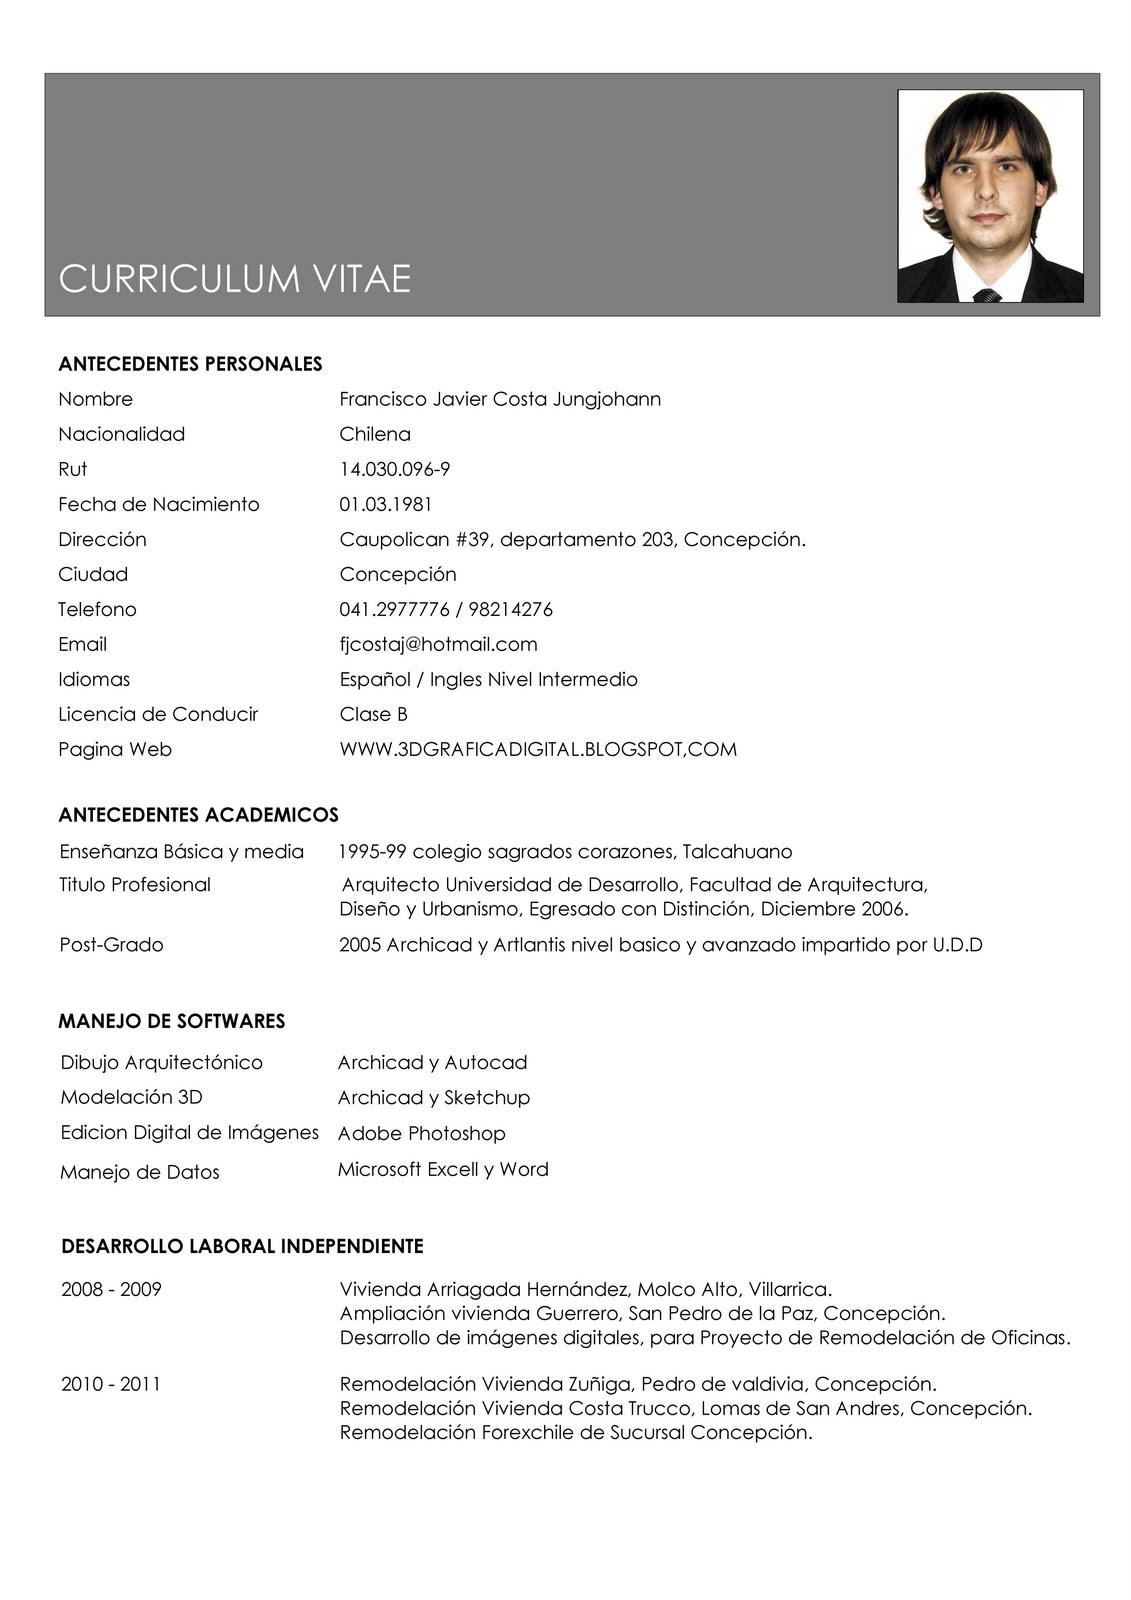 textosterona  textos funcionales  curr u00cdculum v u00cdtae y solicitud de empleo